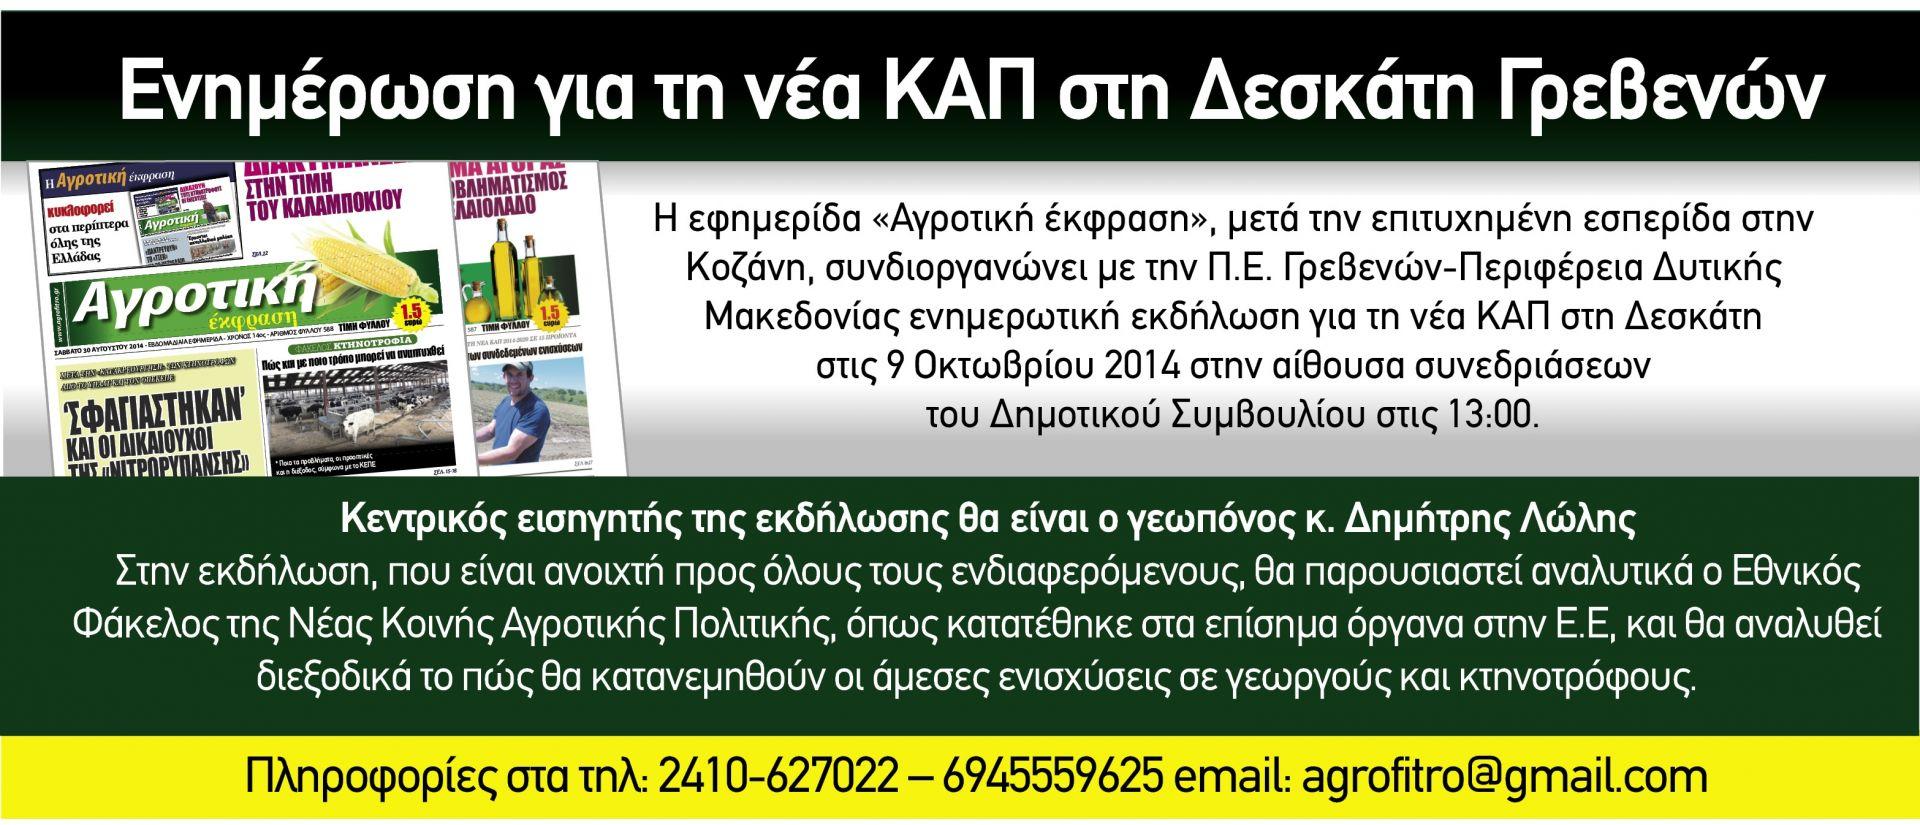 H Περιφέρεια Δυτικής Μακεδονίας συνδιοργανώνει με την εφημερίδα «Αγροτική έκφραση» ενημερωτική εκδήλωση για τη νέα ΚΑΠ στη Δεσκάτη